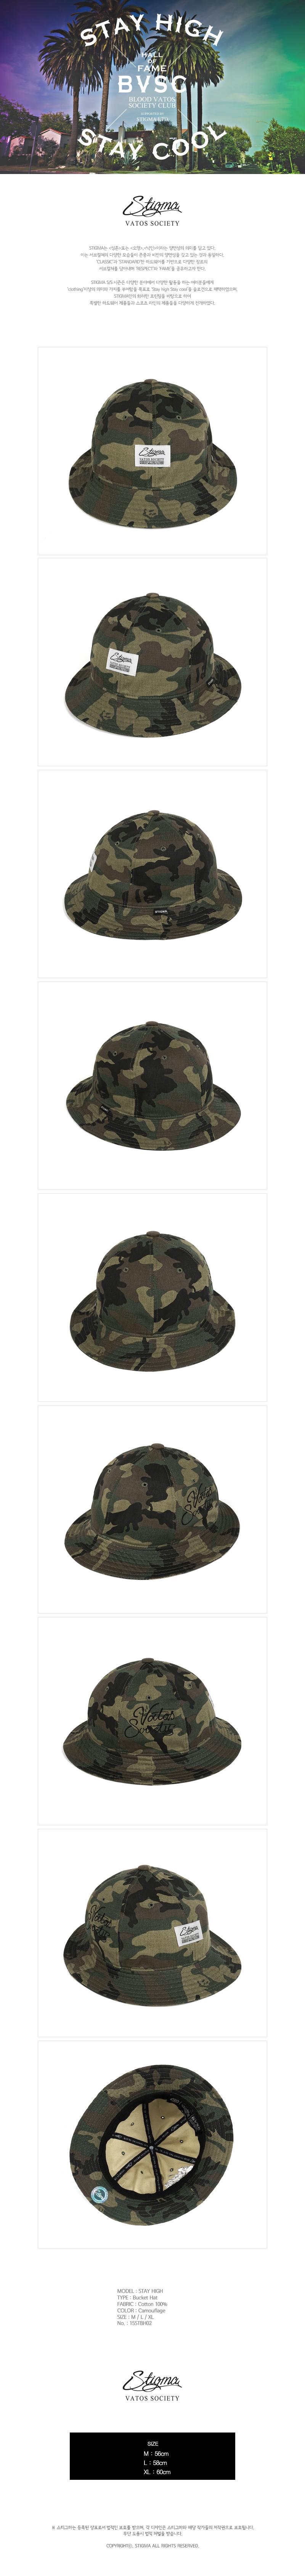 STAY HIGH BUCKET HAT CAMO - 스티그마, 45,000원, 모자, 페도라/베레모